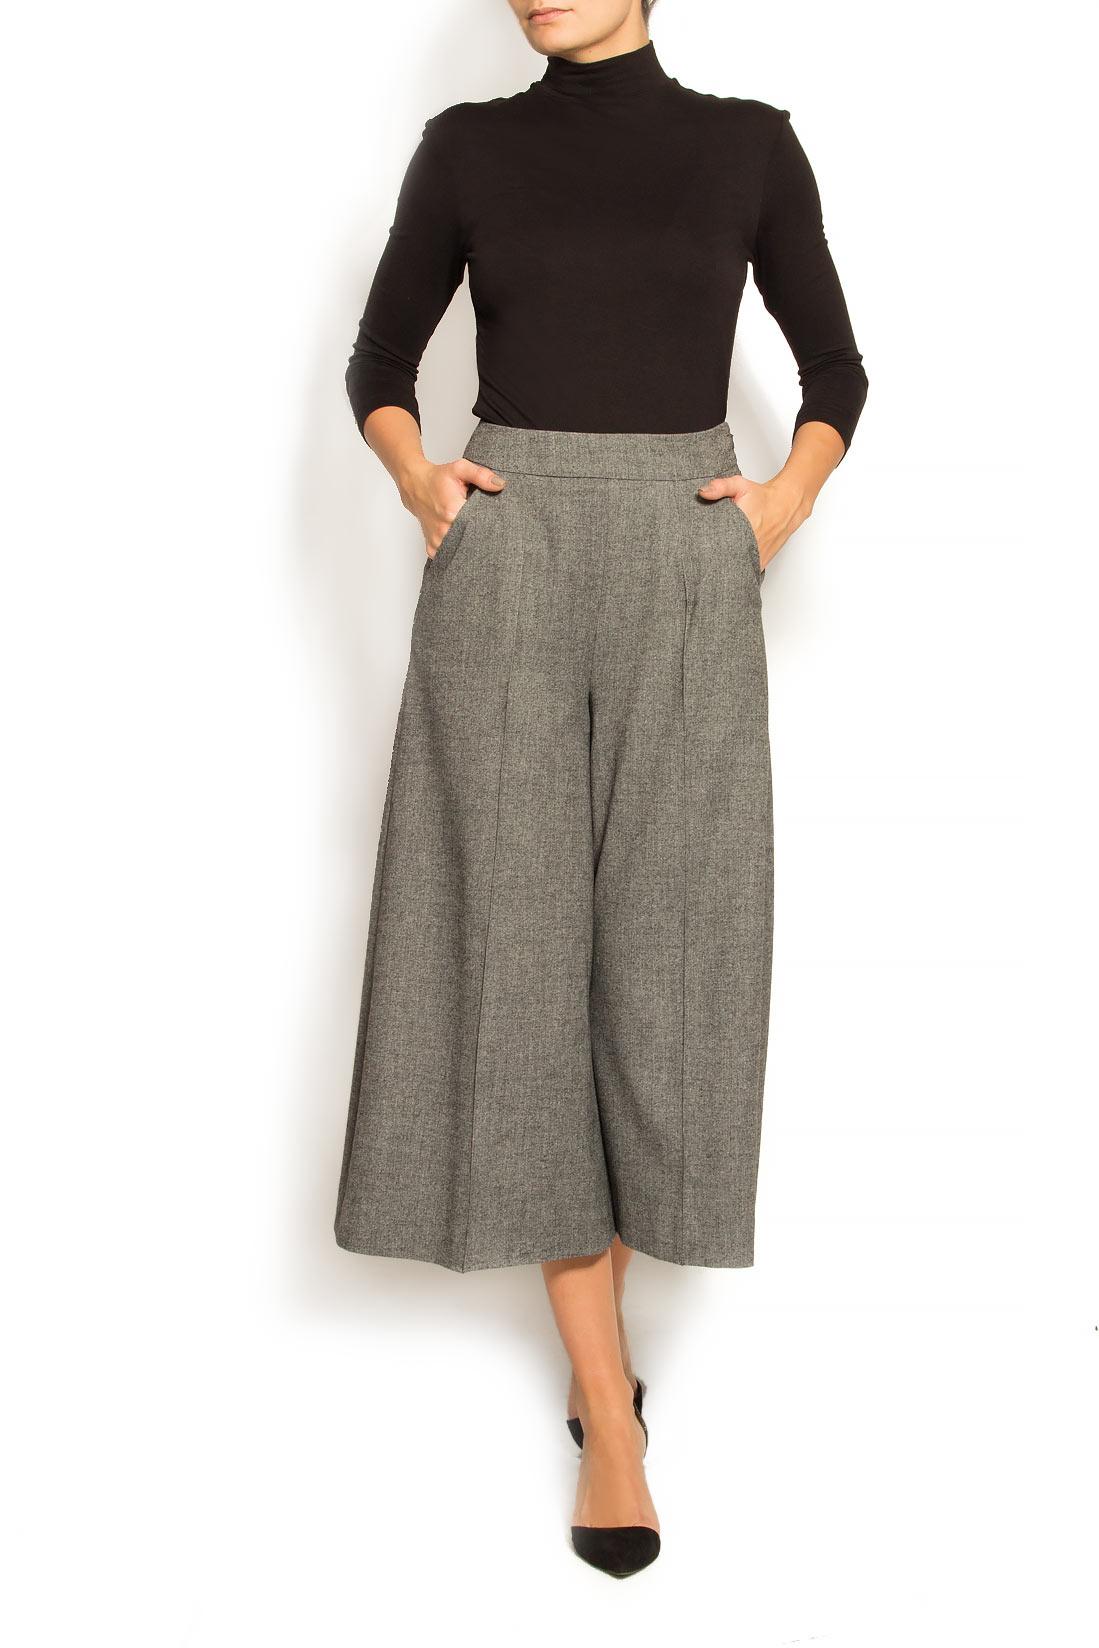 Pantaloni culot din stofa de lana Lena Criveanu imagine 0